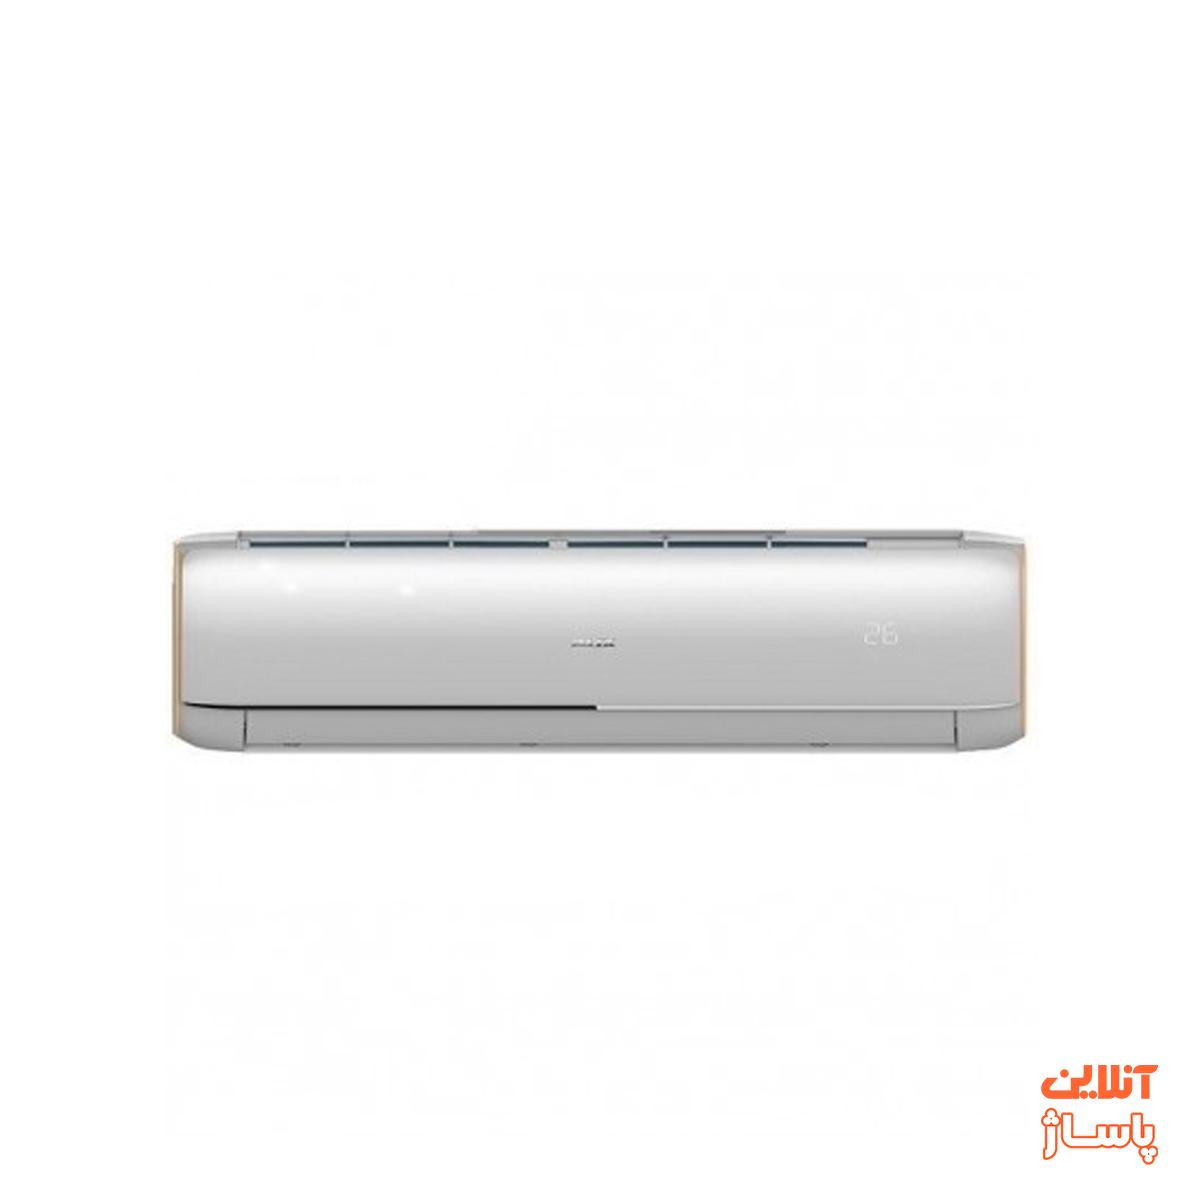 کولر گازی سرد و گرم اینورتر آکس مدل ZT112A4/D1